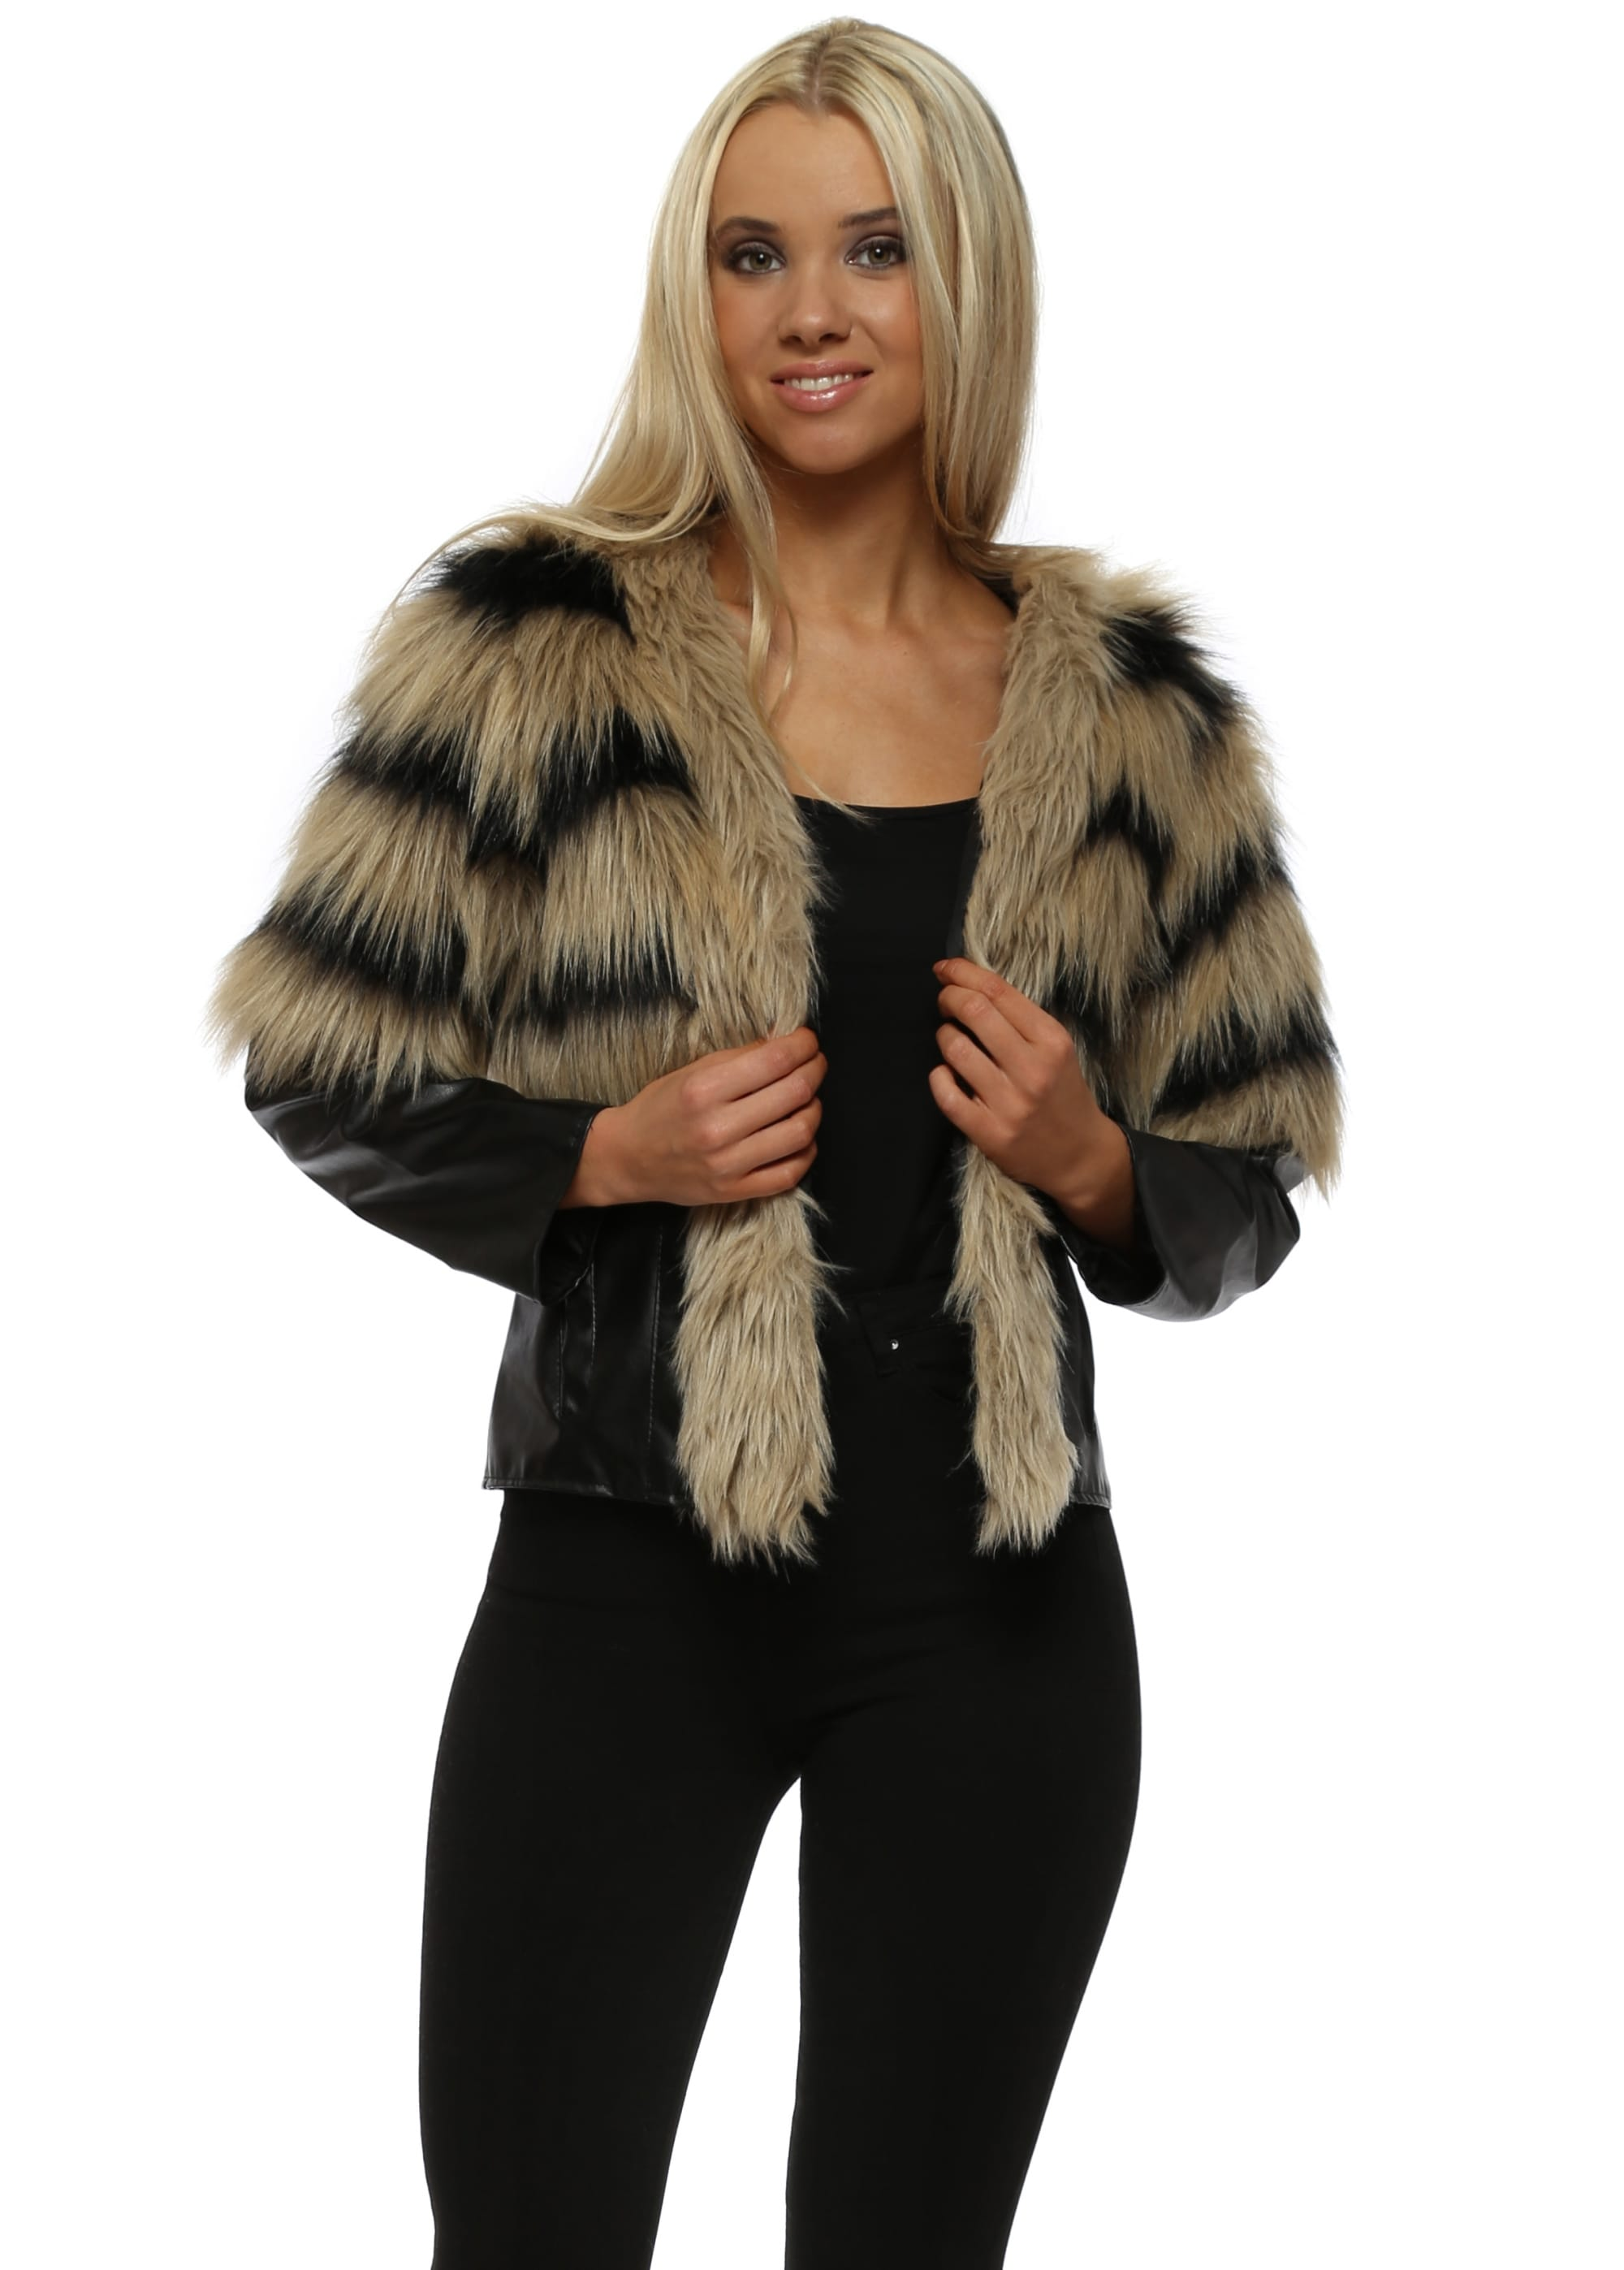 1ad985c0137 Faux Fur PVC Cropped Rambo Jacket